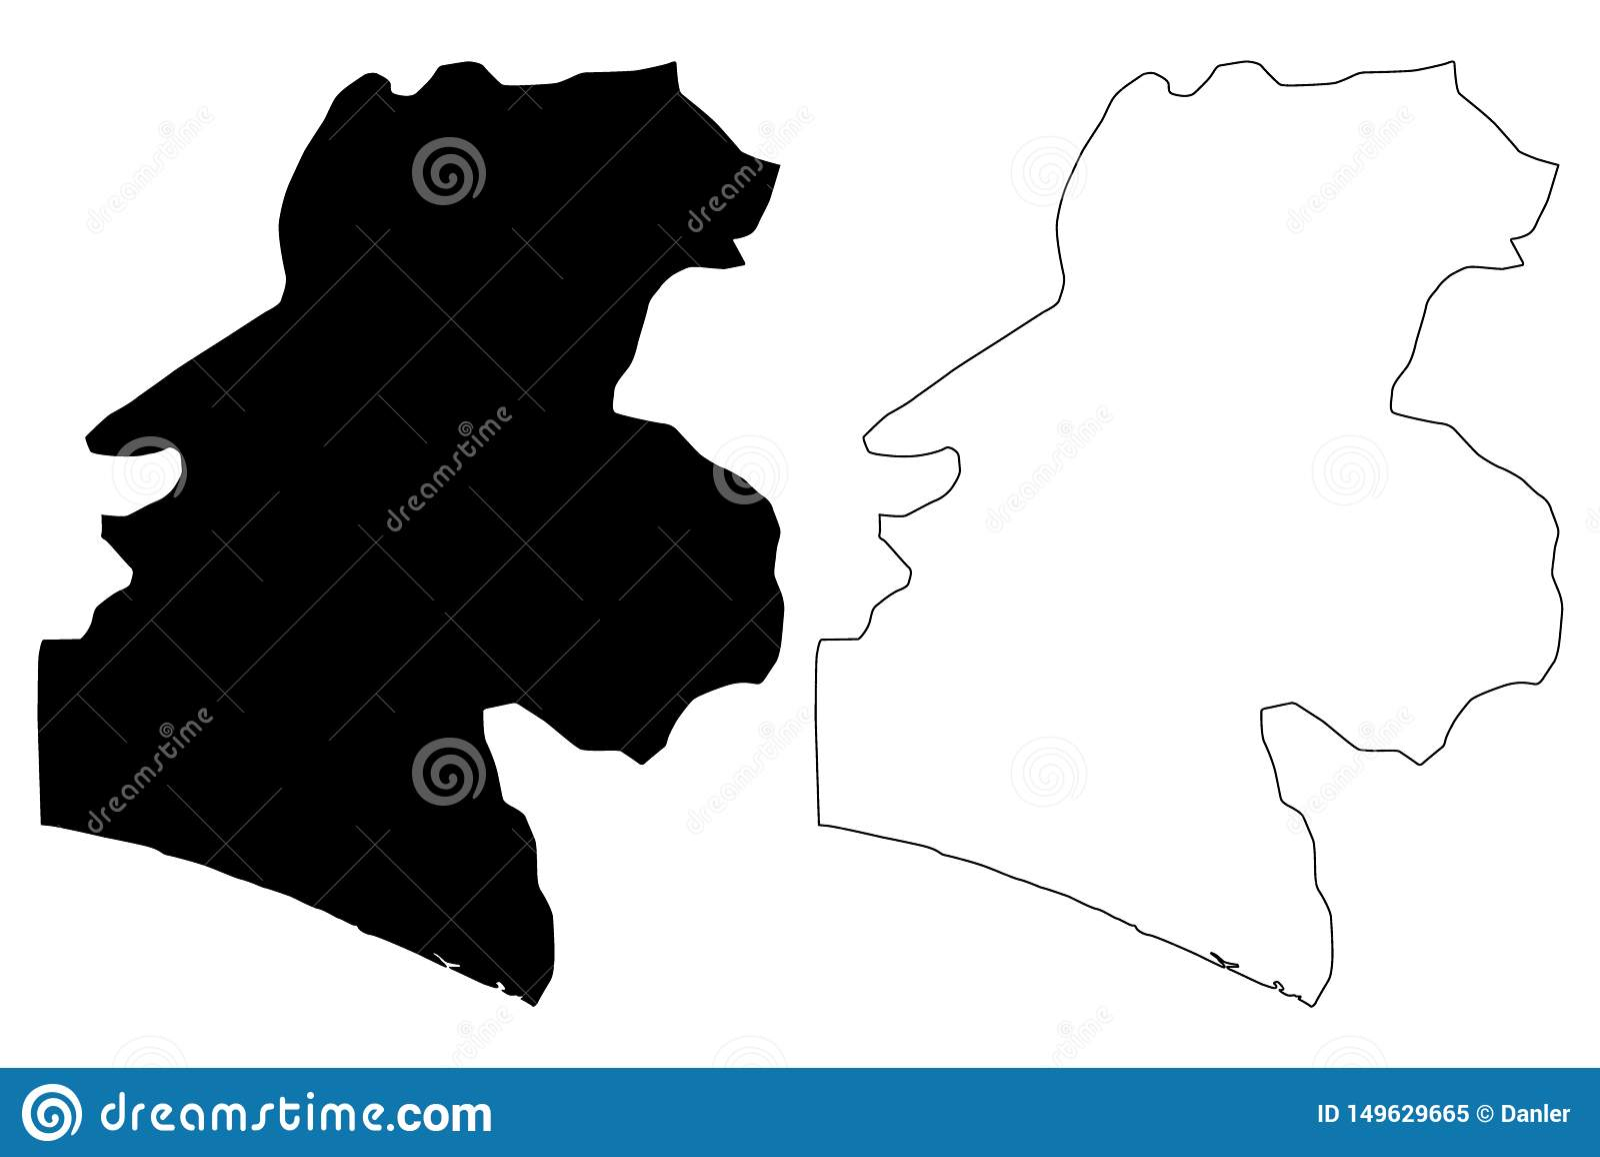 Santa Rosa Department Republic Of Guatemala, Departments Of ... on map of france departments, guatemalan departments, map de guatemala, map of georgia departments, map of mexico and belize, map of colombia departments,